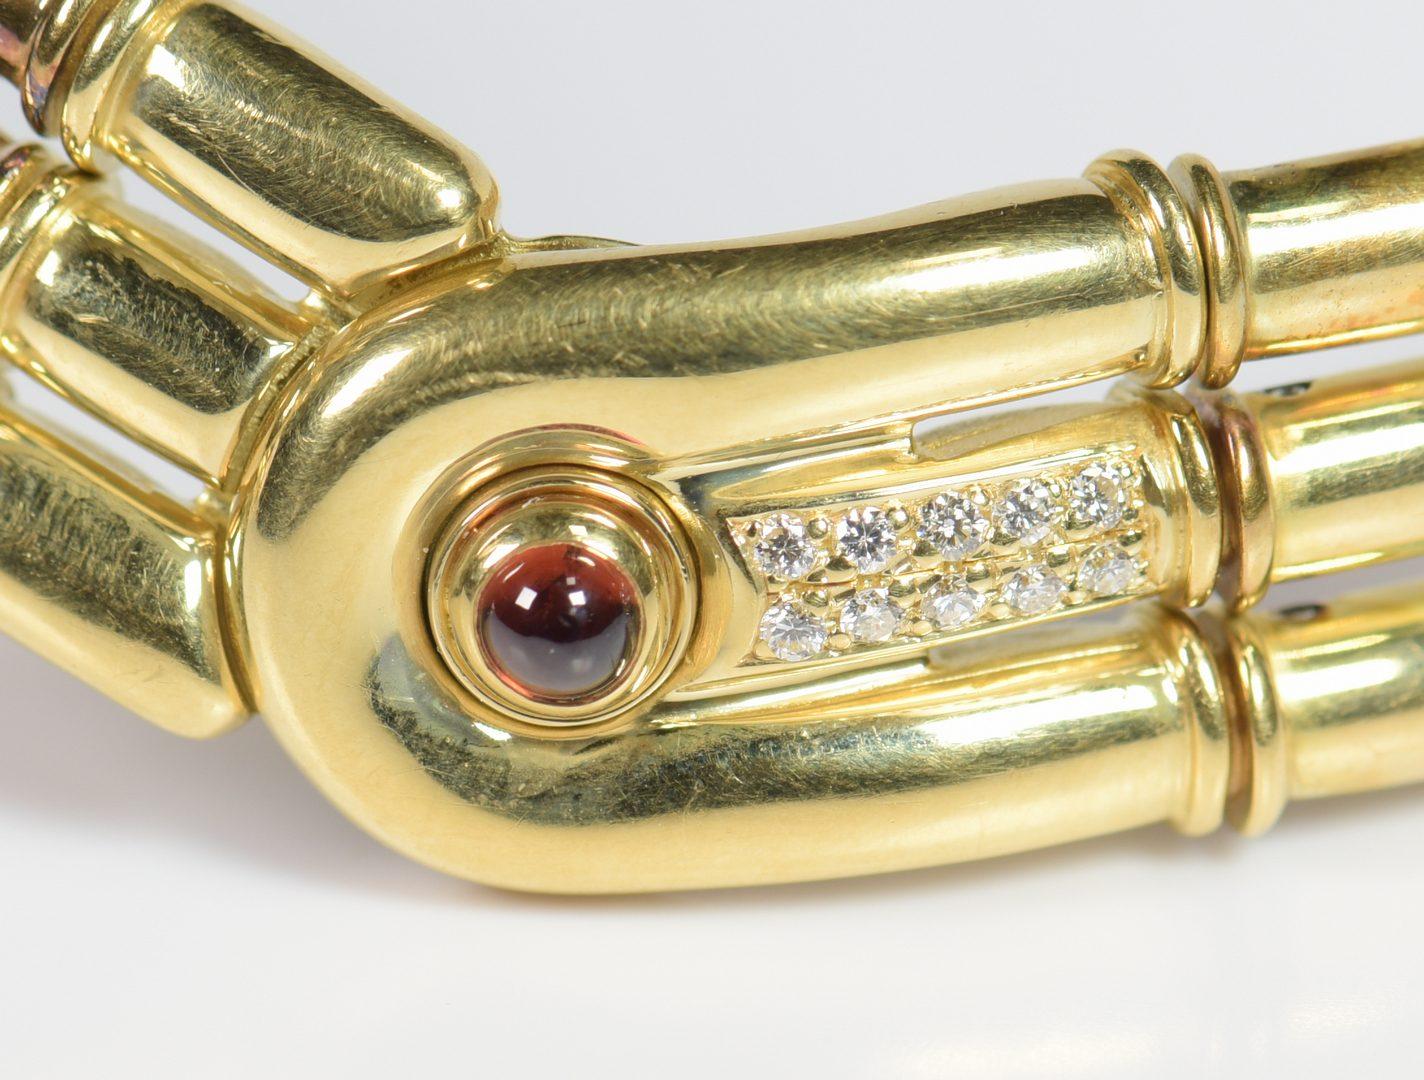 Lot 402: Di Modolo 18K Ring and Bracelet Set